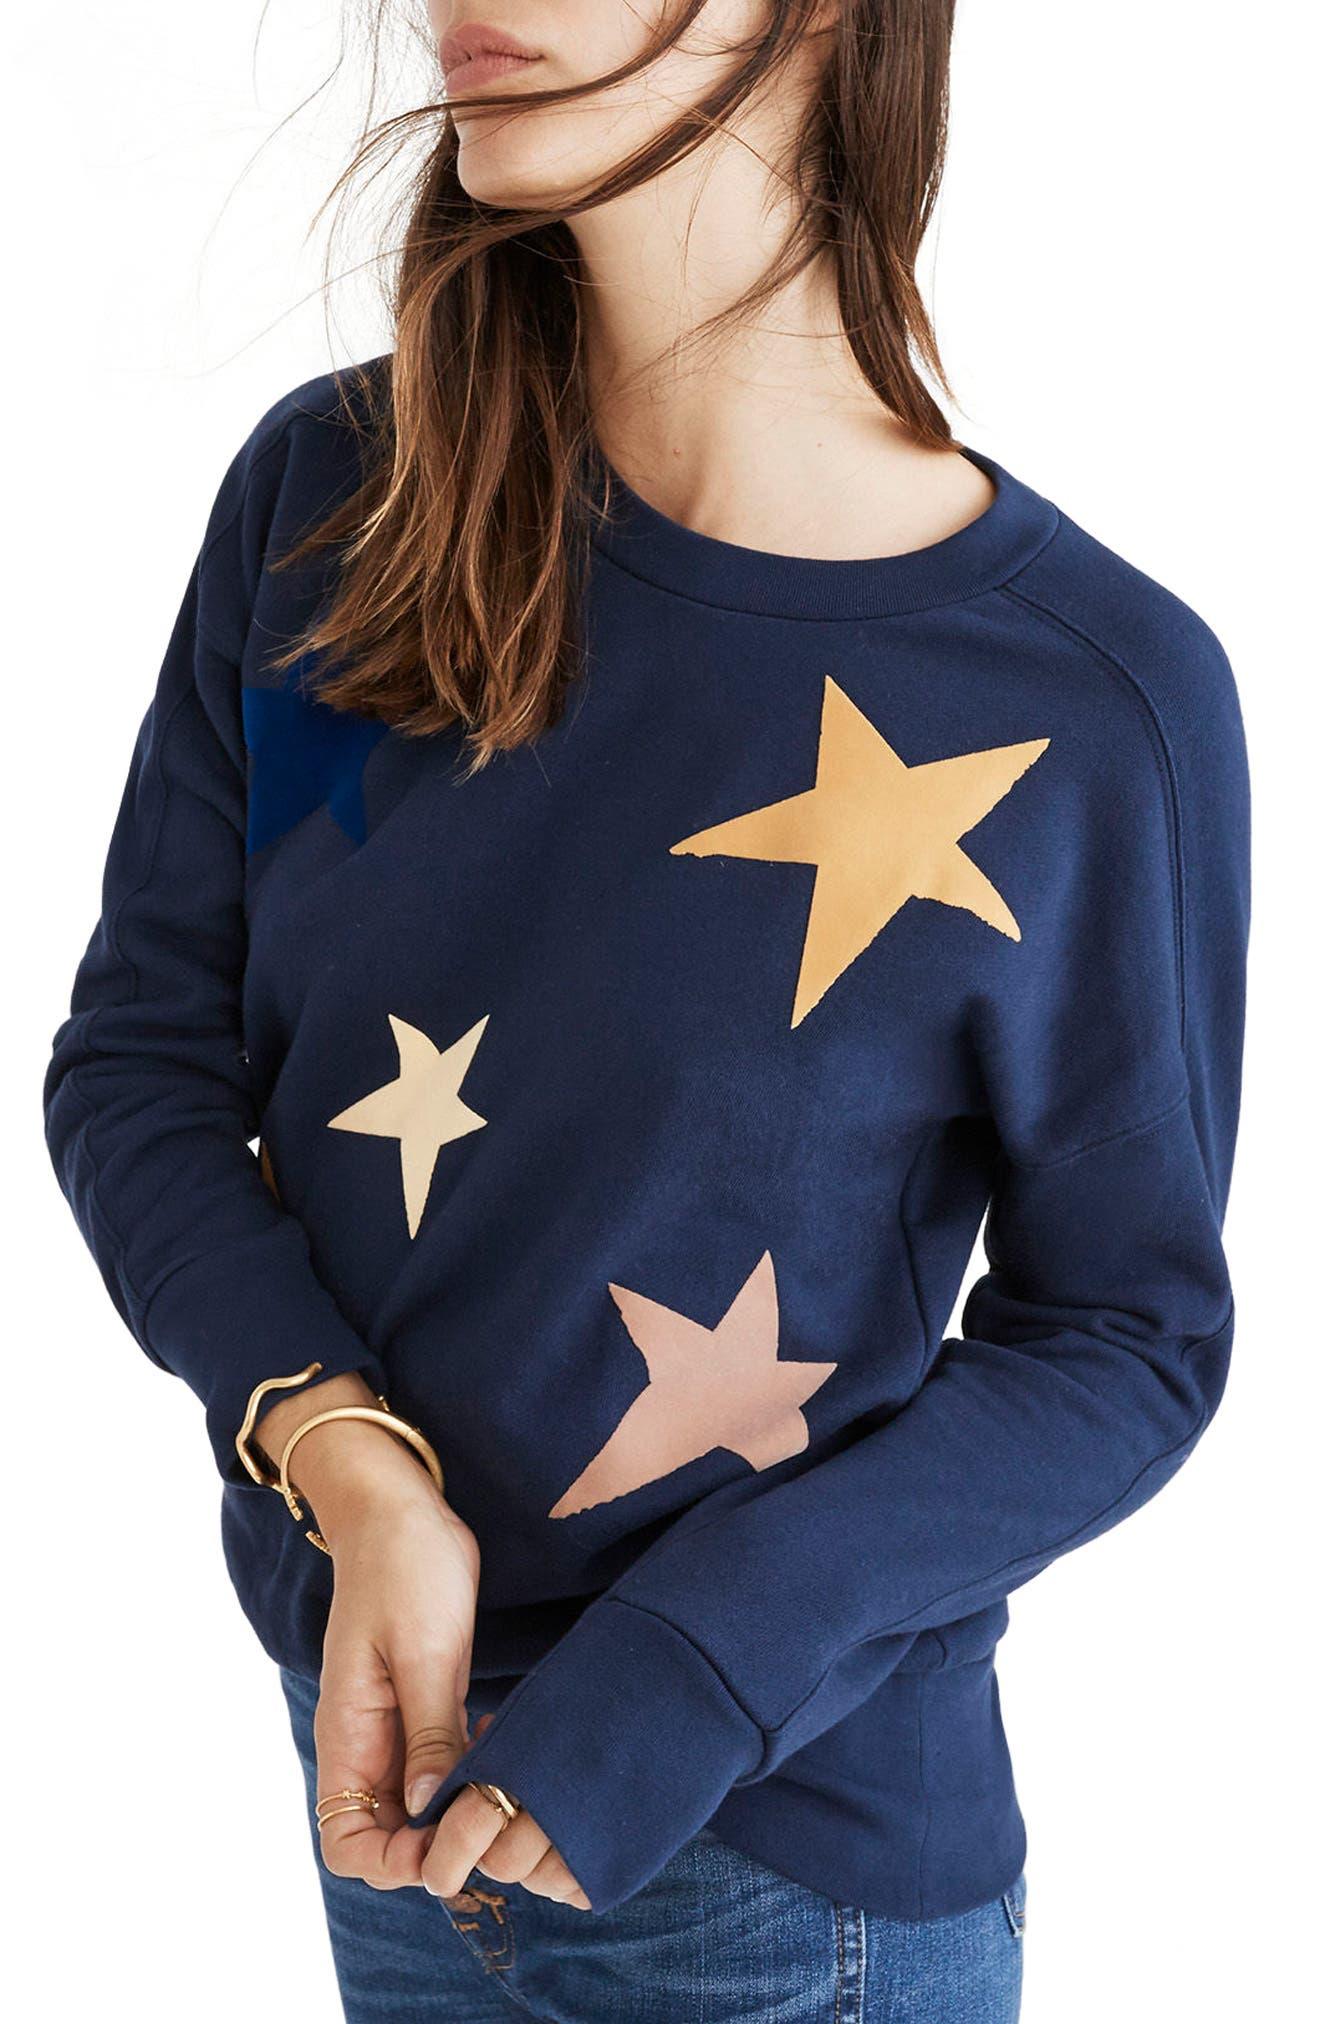 Starry Sweatshirt,                             Main thumbnail 1, color,                             410